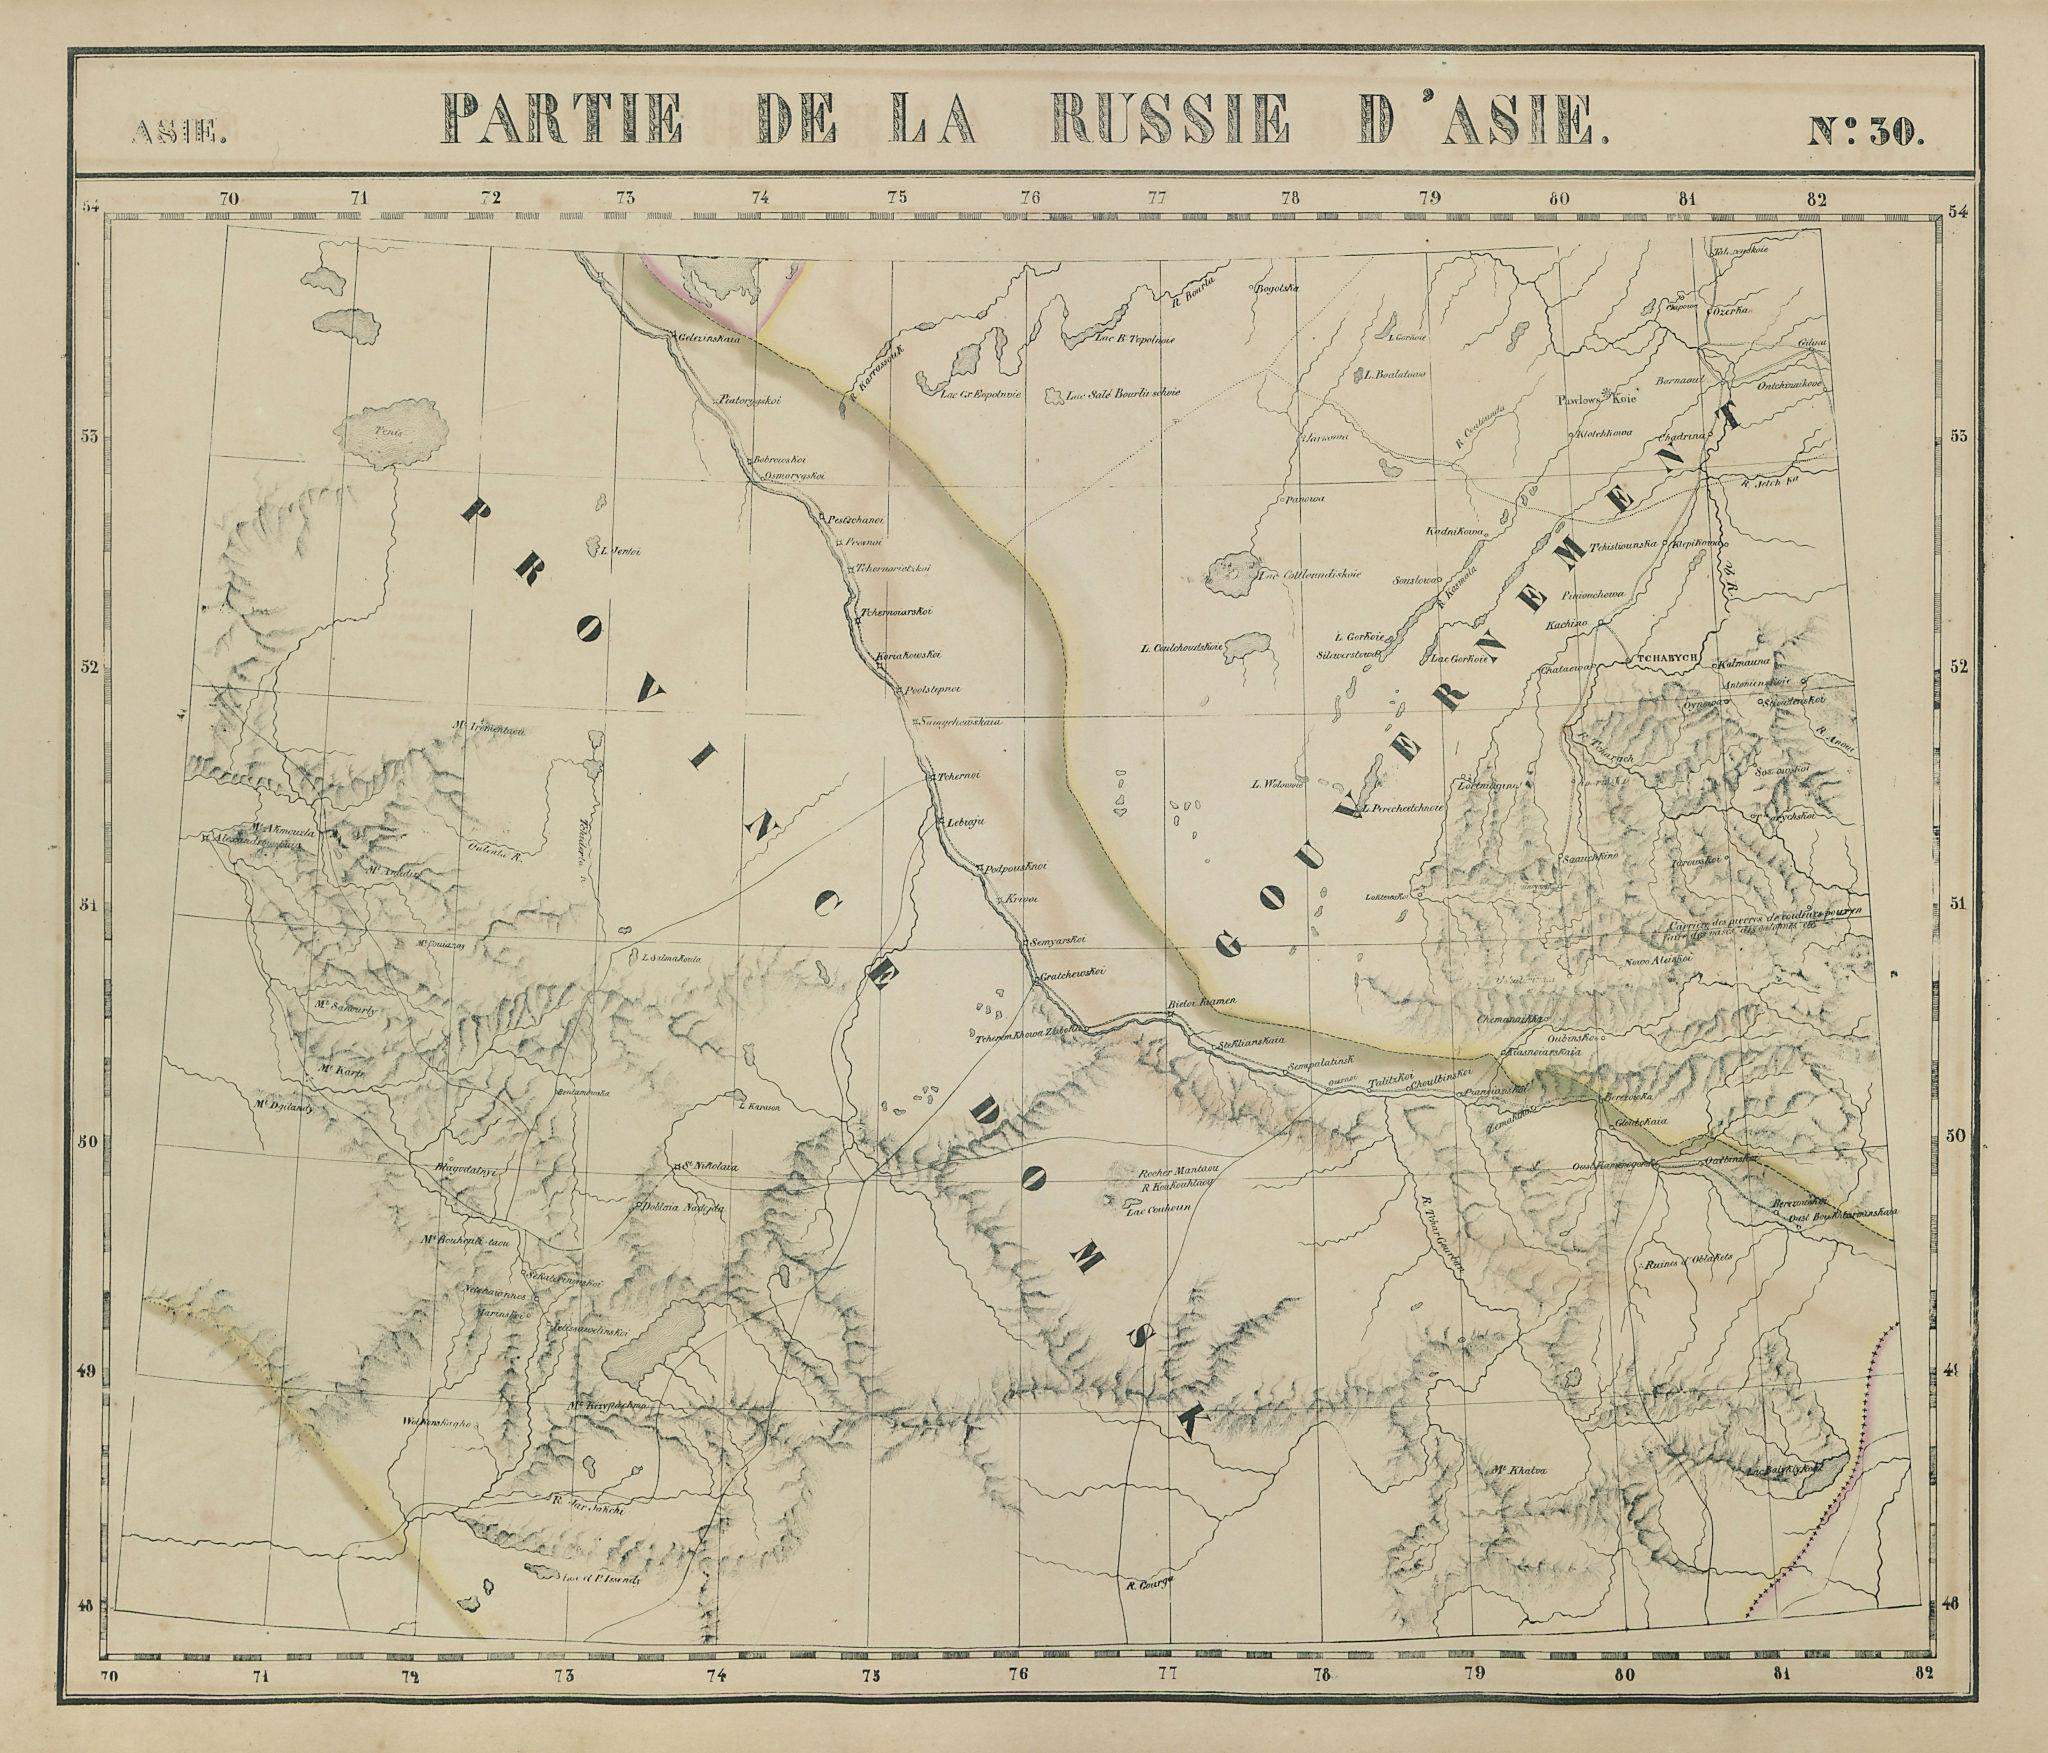 Russie d'Asie #30 NE Kazakhstan. Altai Krai Irtysh Russia VANDERMAELEN 1827 map